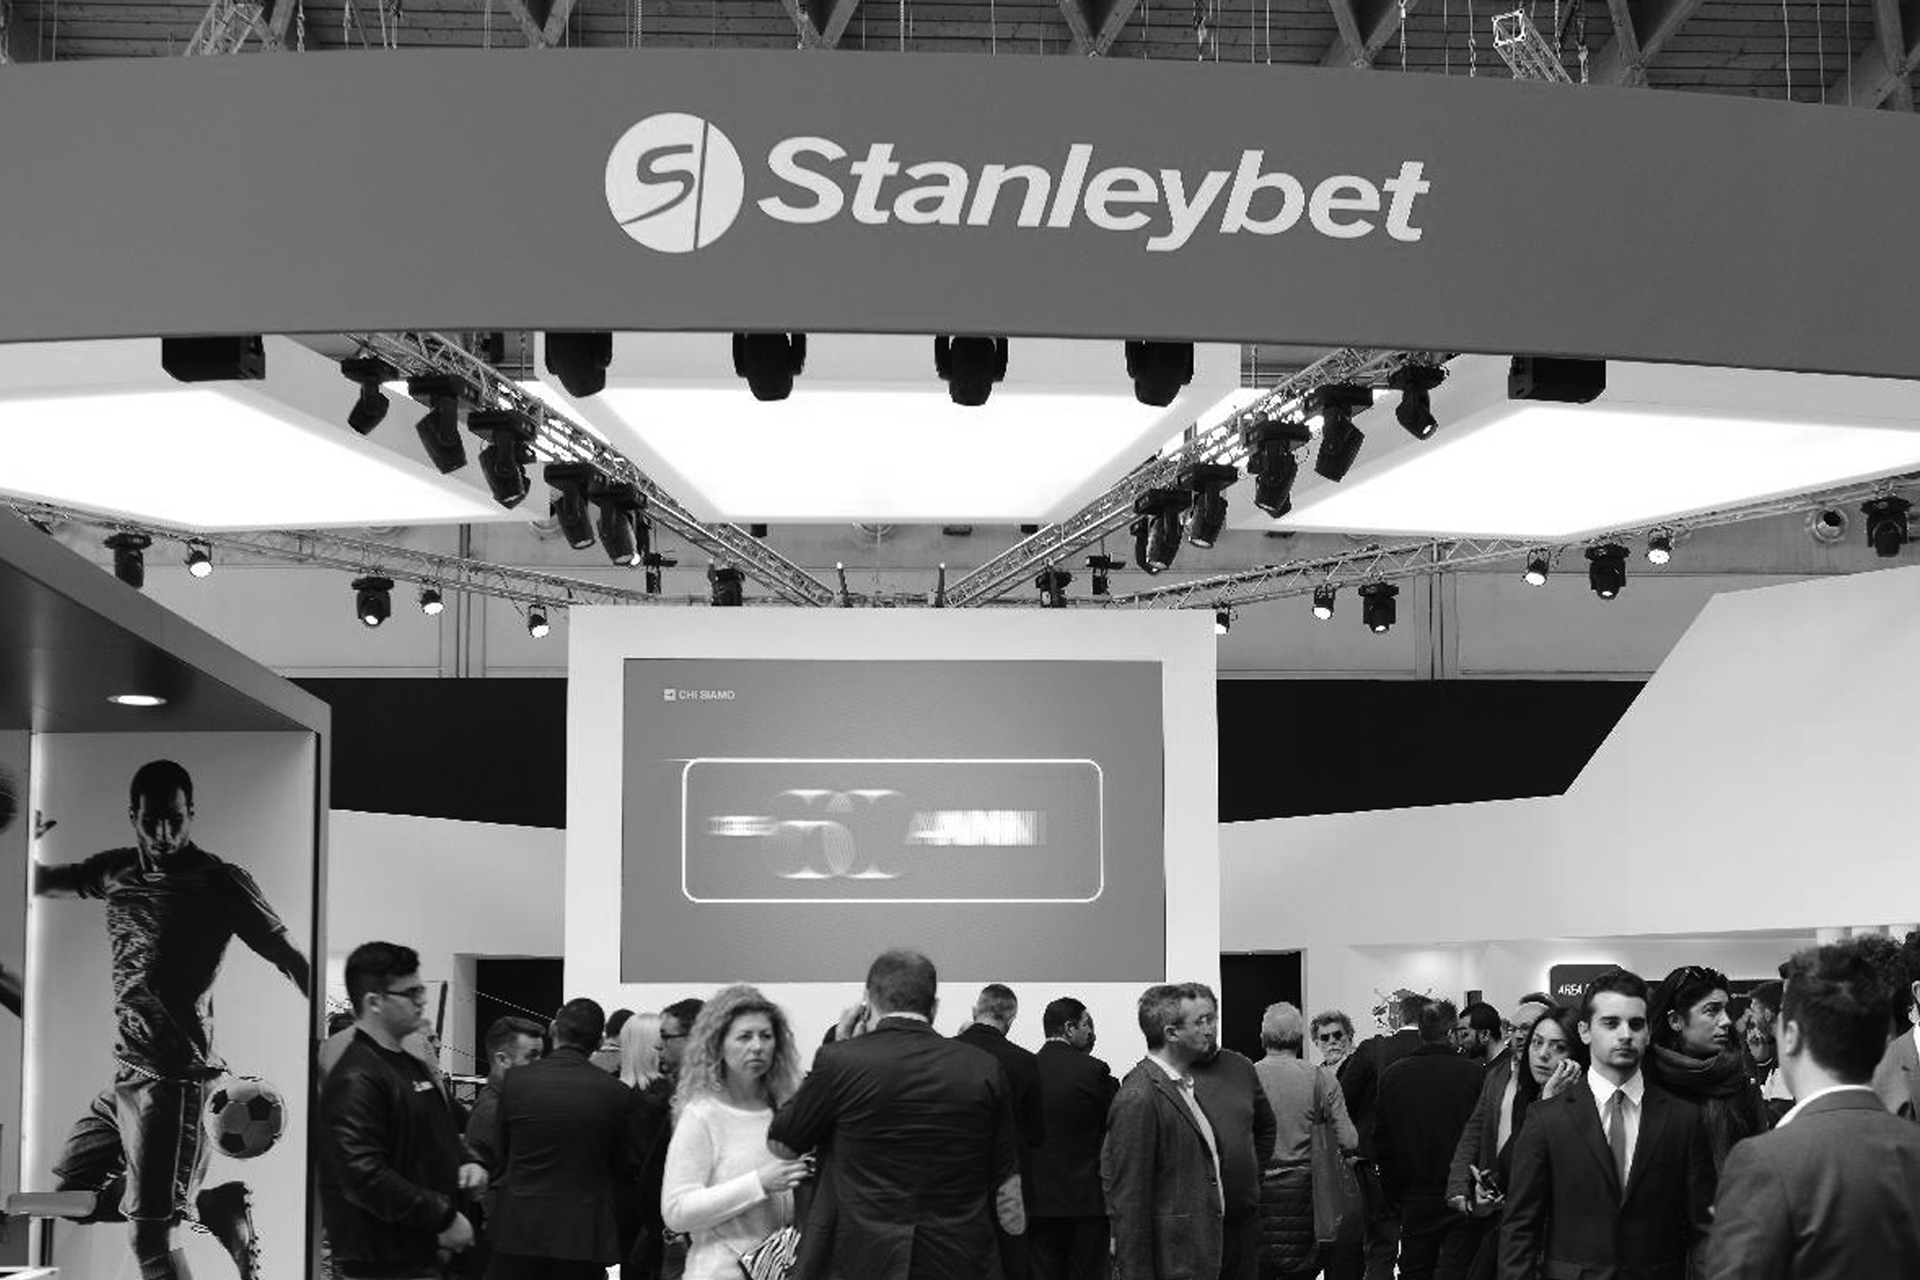 Stanley-bet-article